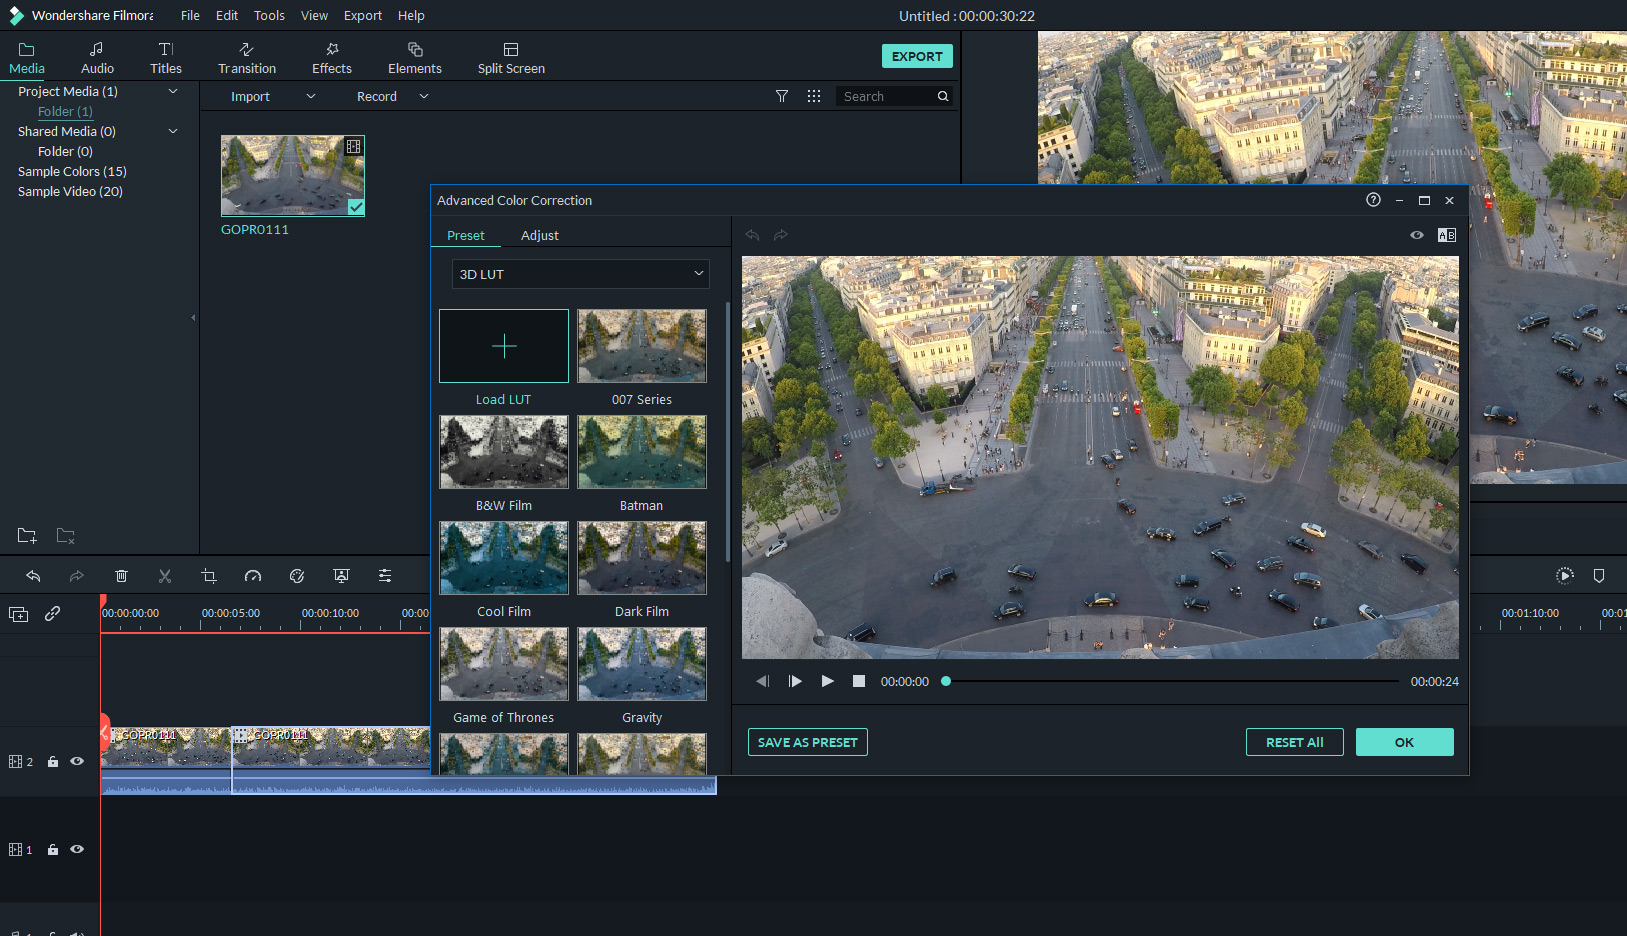 Wondershare Filmora15 Video Editing Software Review   FilterGrade